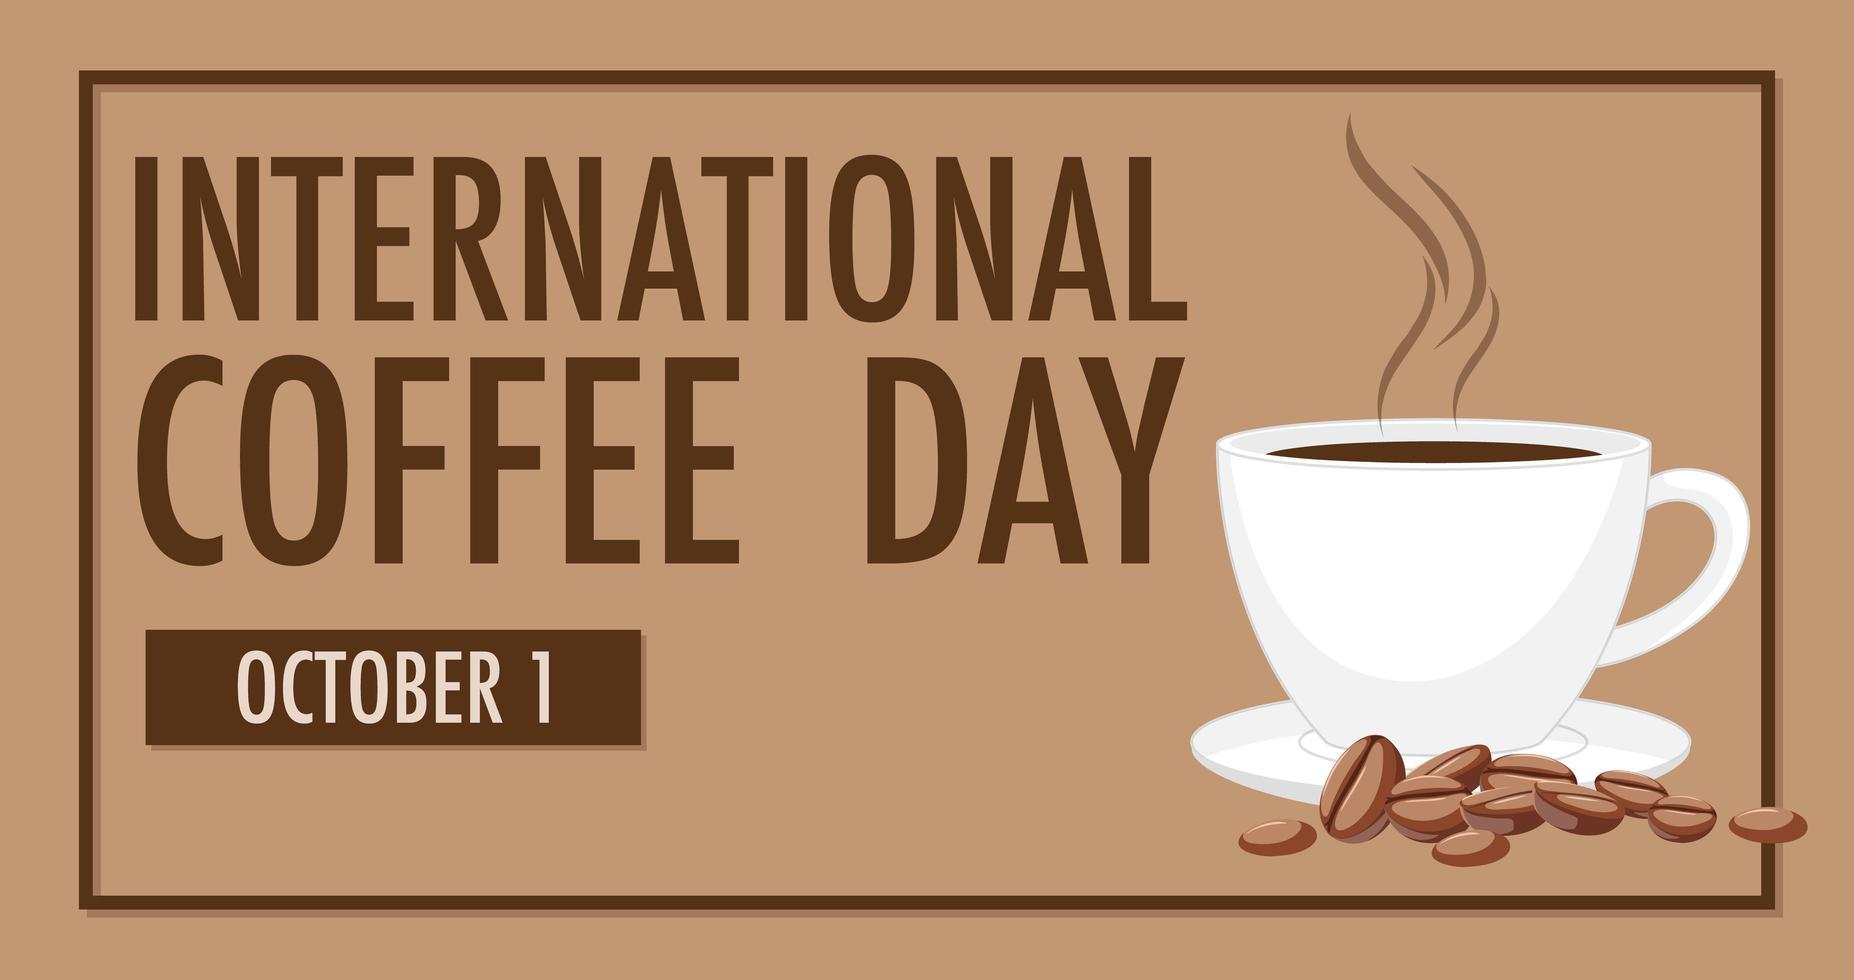 internationales Kaffeetagsbanner vektor